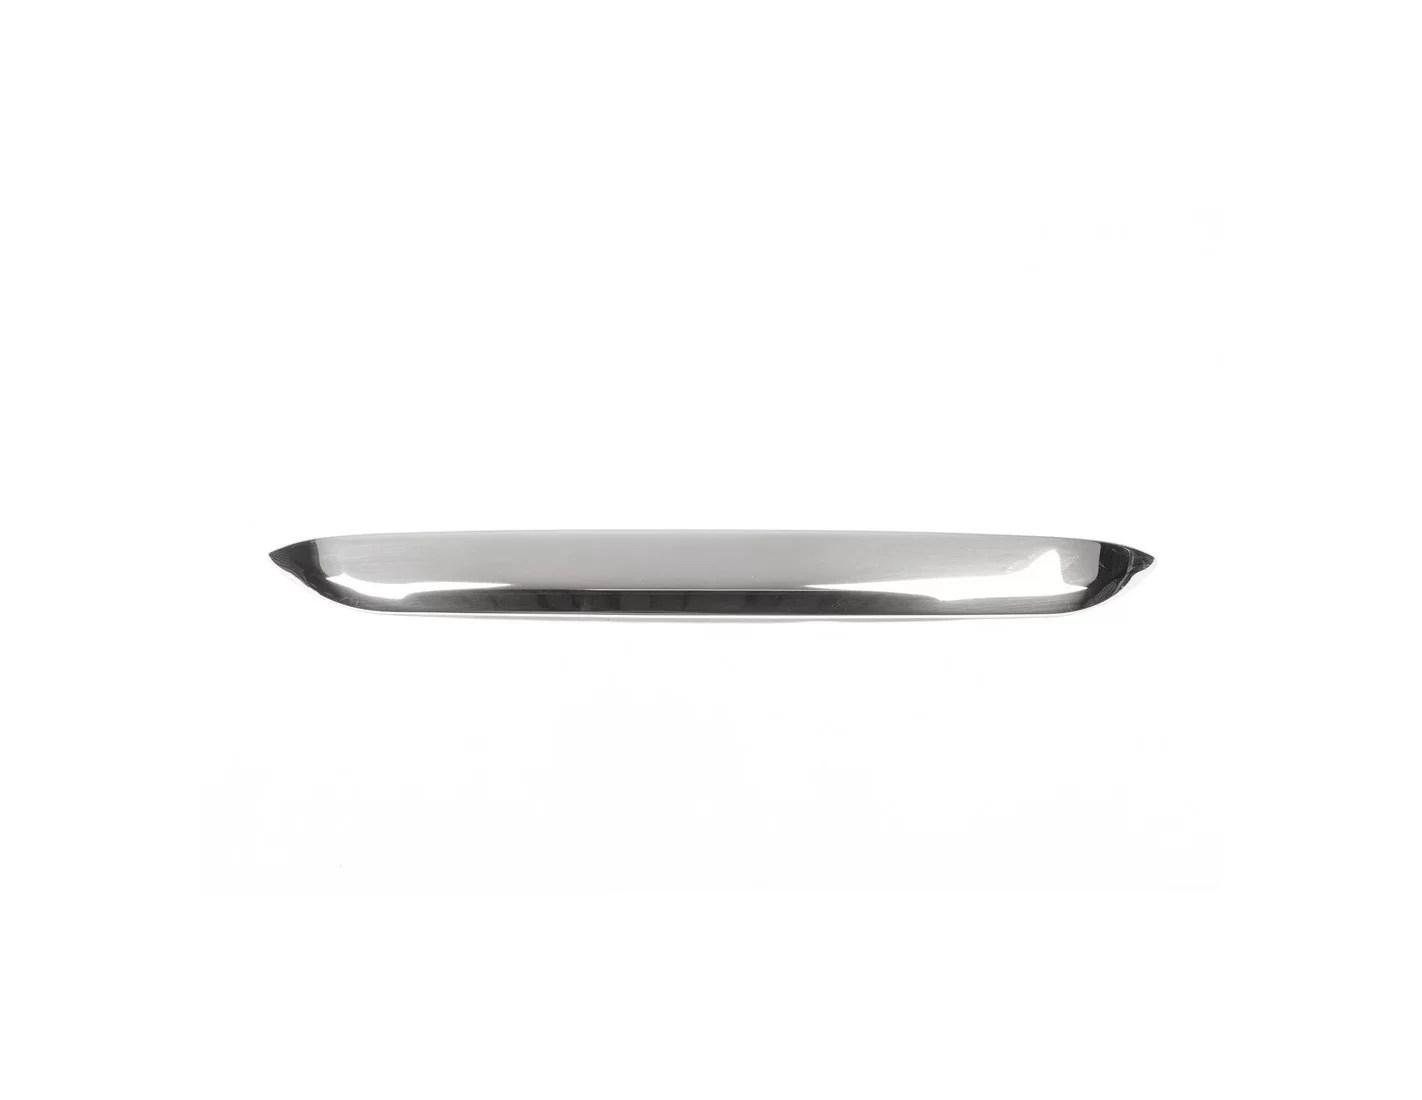 hight resolution of 2003 subaru legacy stereo wiring diagram imageresizertool com off road subaru loyale subaru loyale turbo